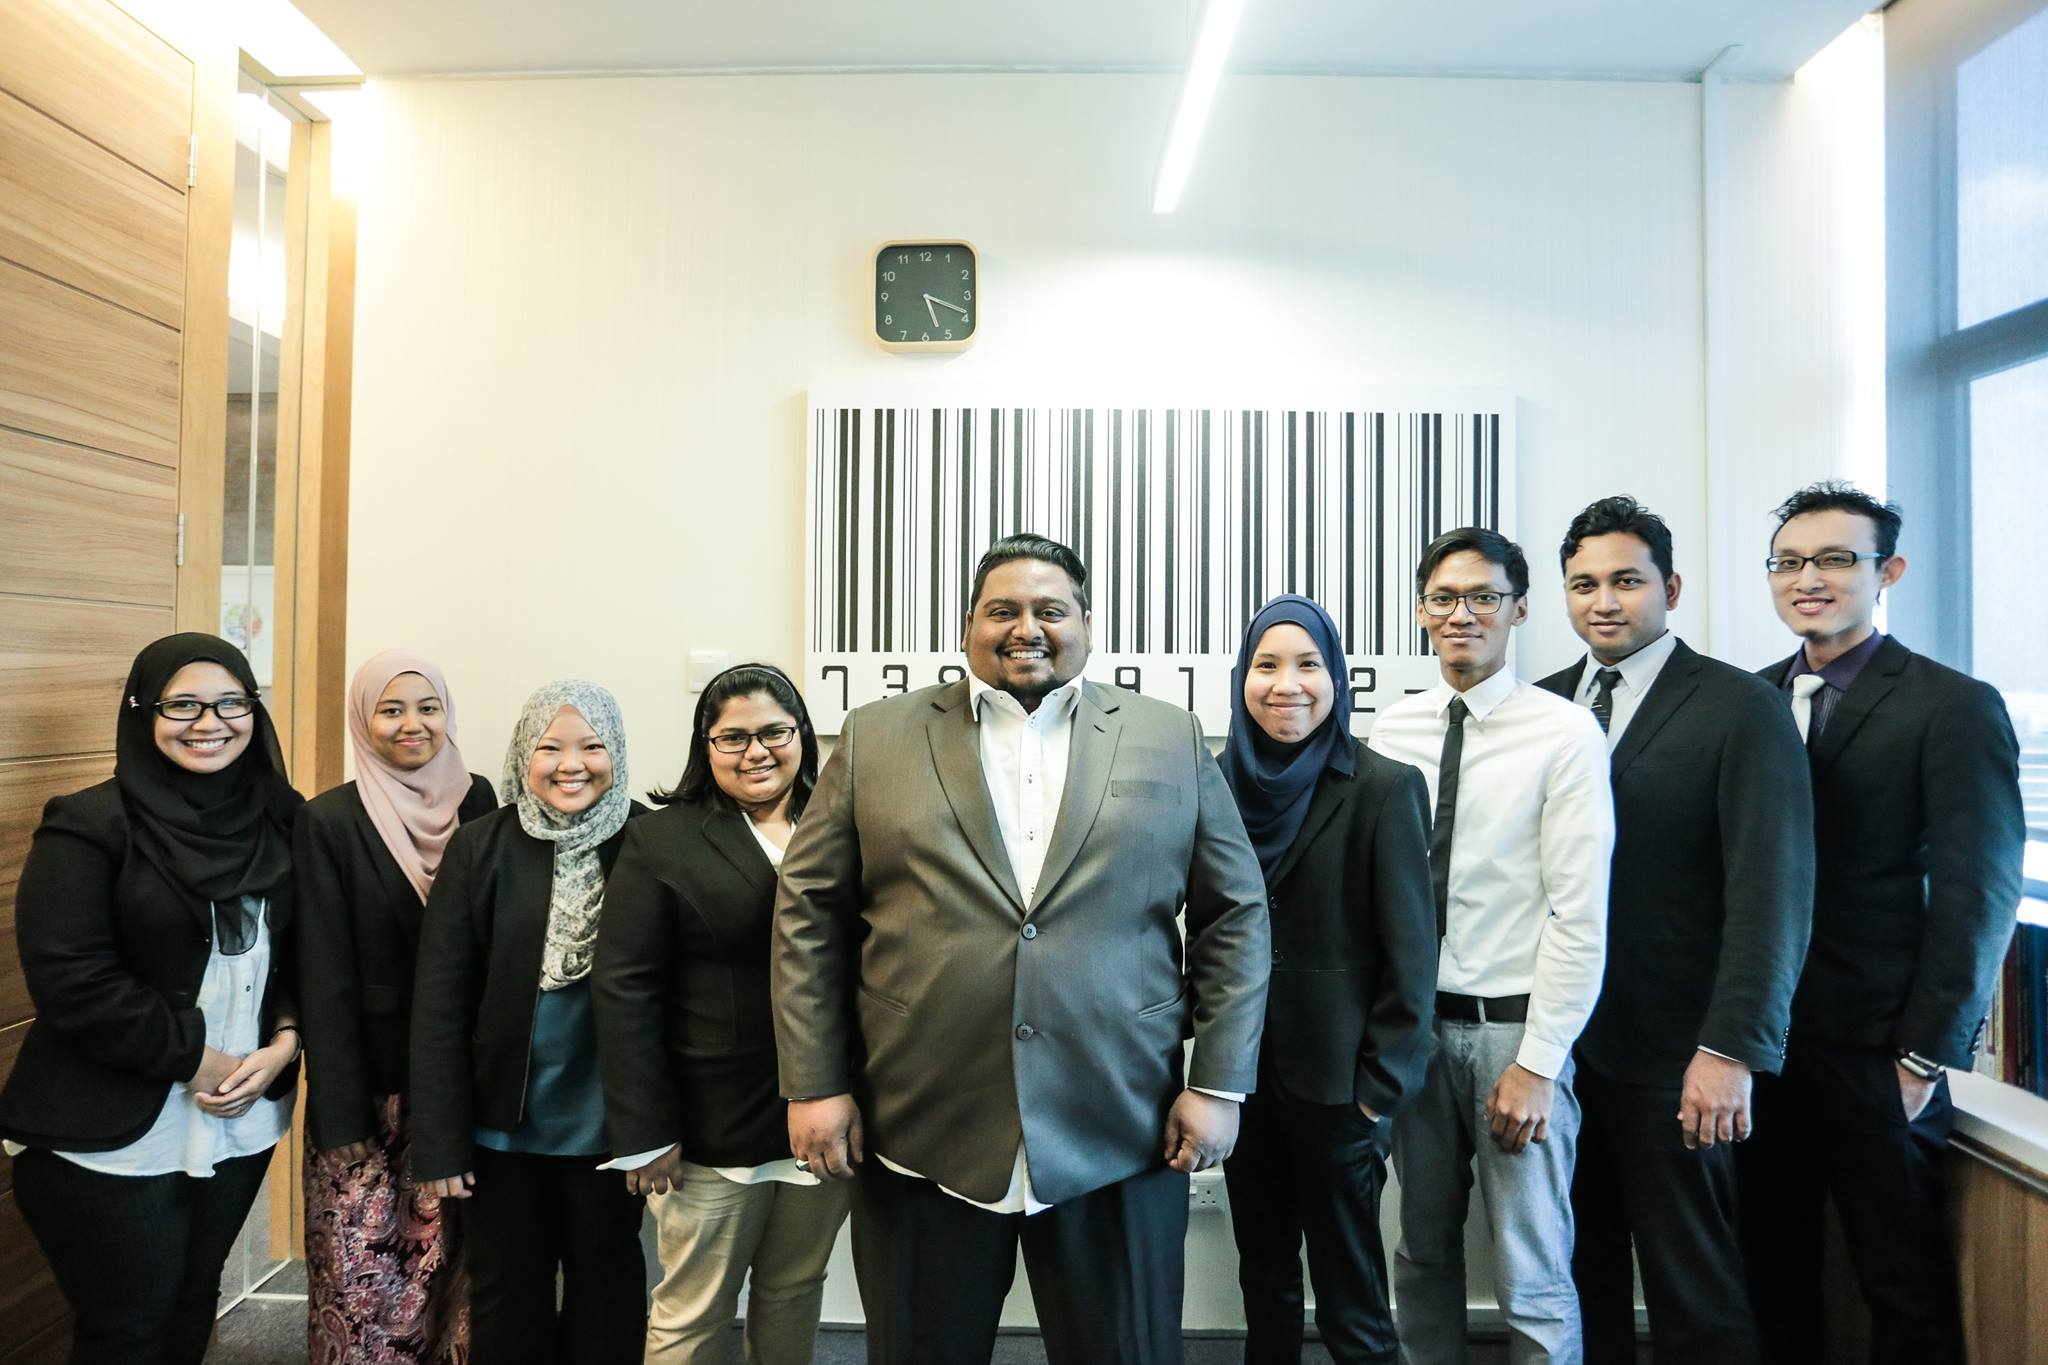 MFazPartners MFP Mohamed Fazluddin and Partners